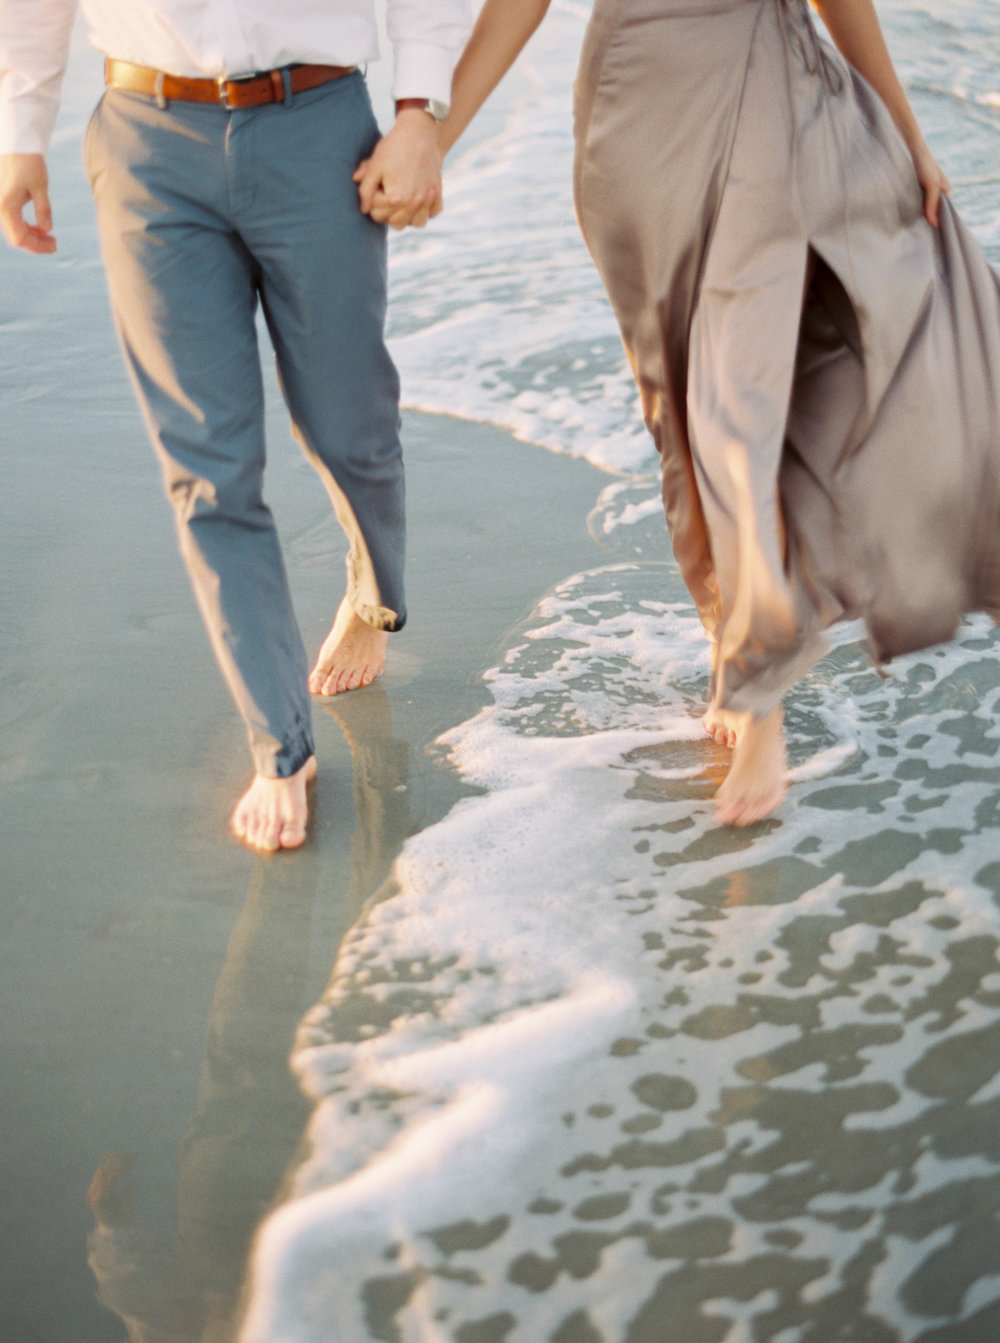 Cannon+beach+engagement+session+film+photographer-1.jpg